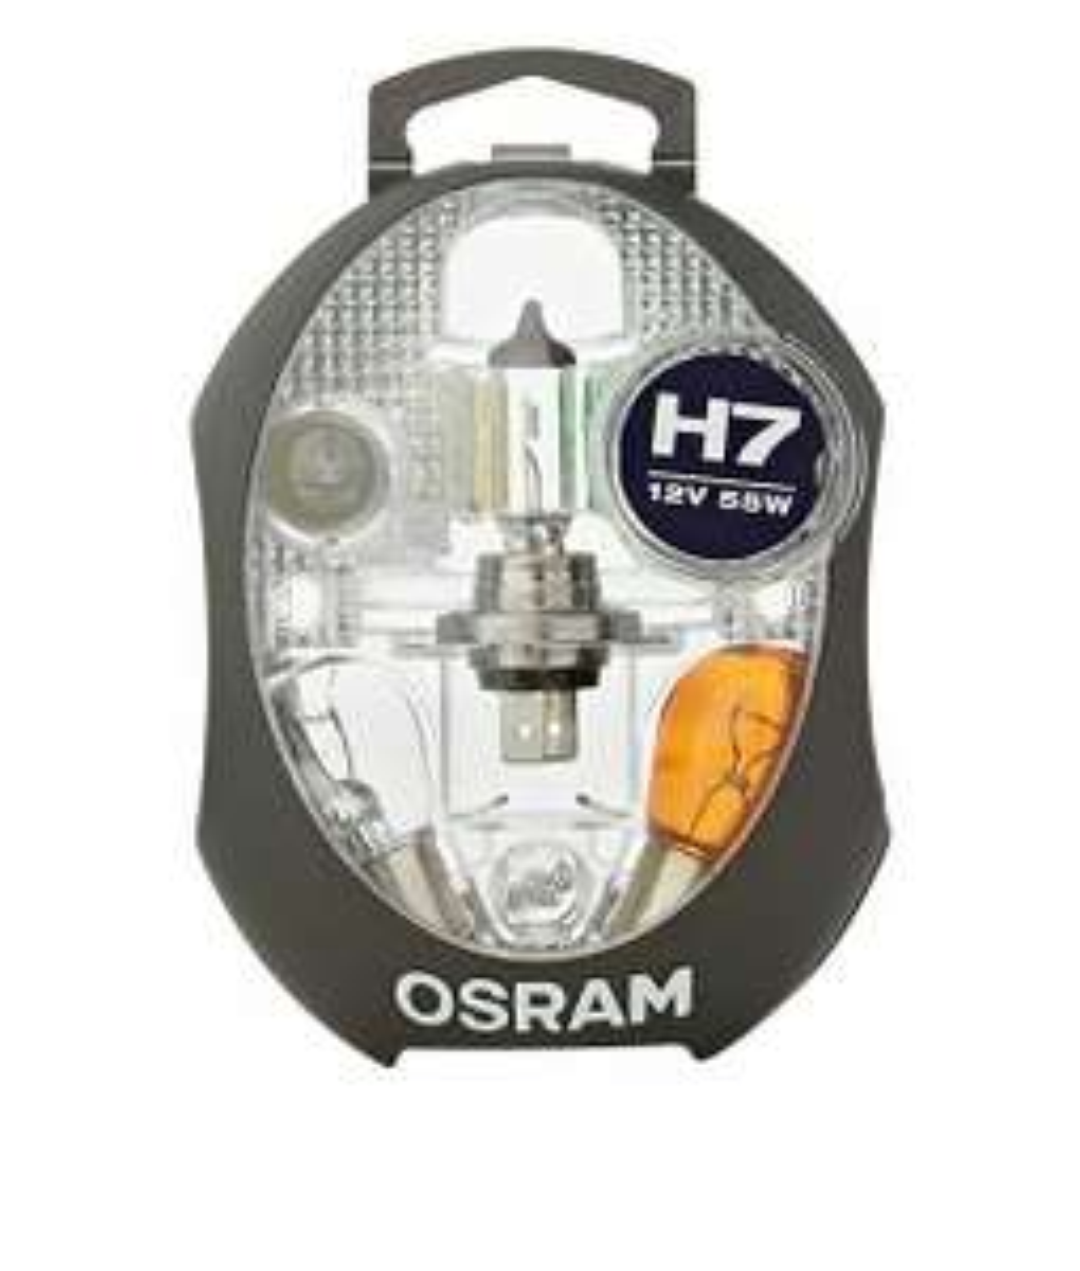 OSRAM ORIGINAL Ersatzlampenbox H7